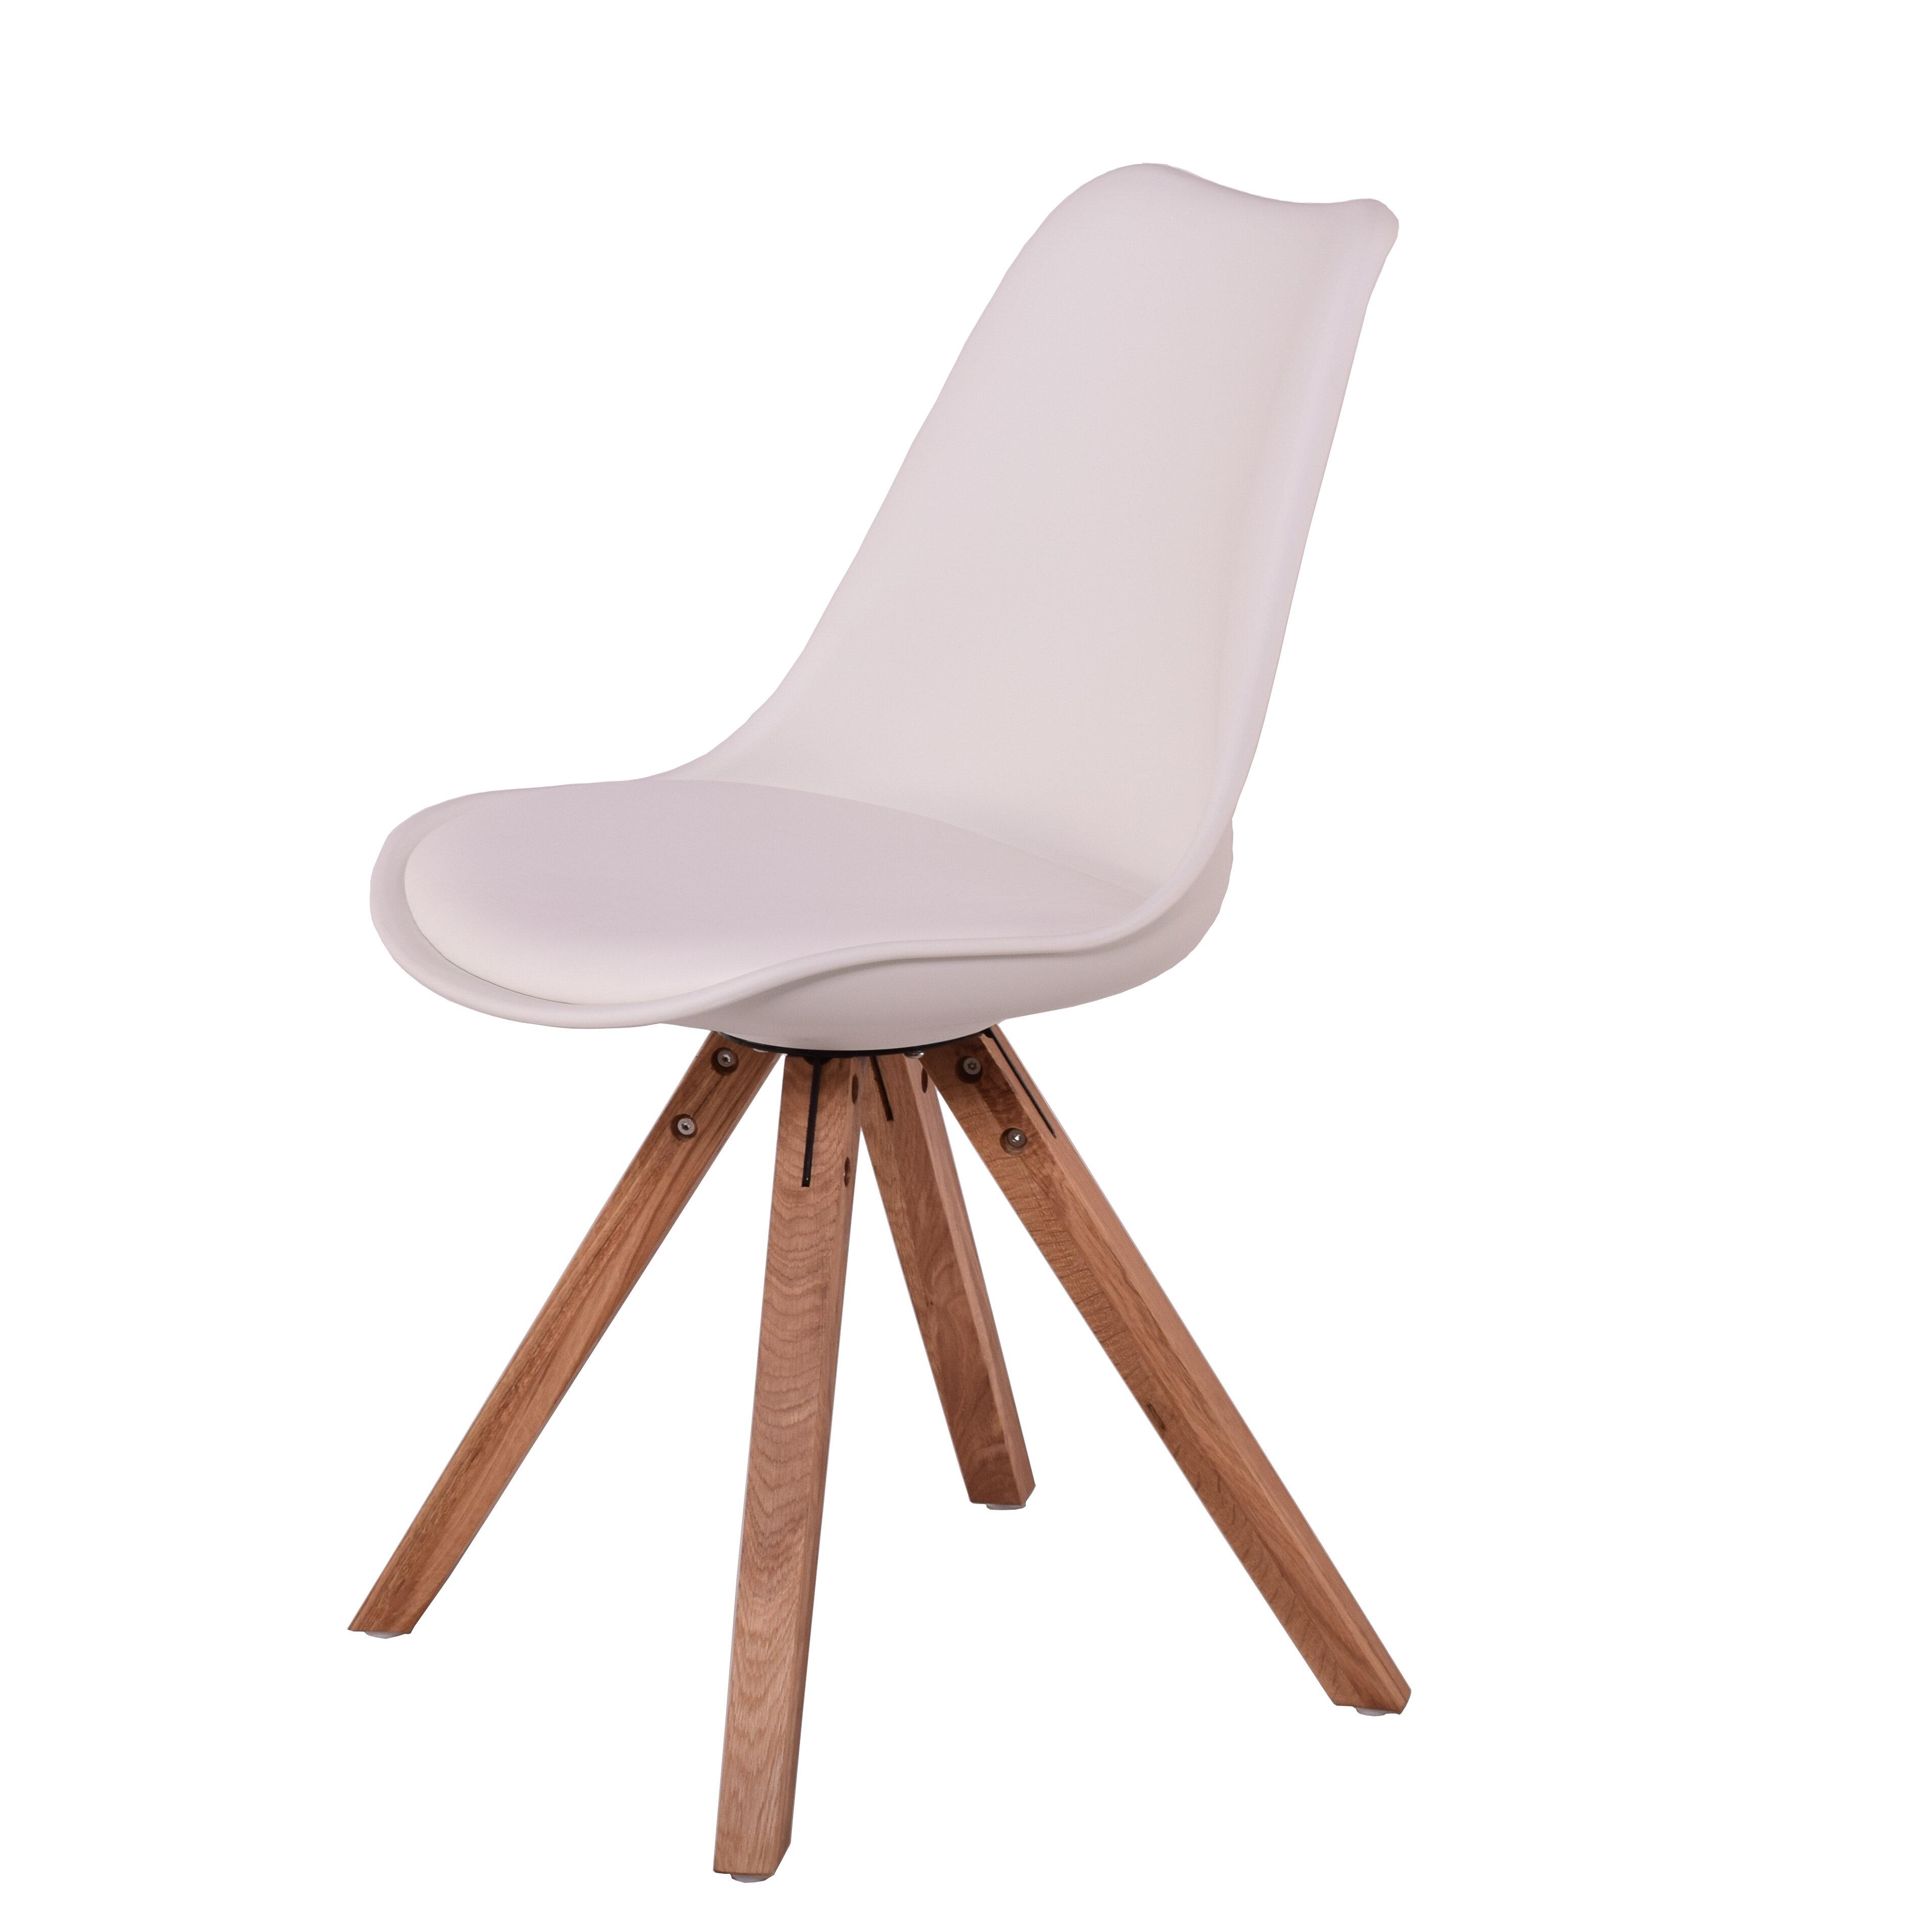 9820ff1422 Modern Chairs USA Lugano Upholstered Dining Chair   Wayfair